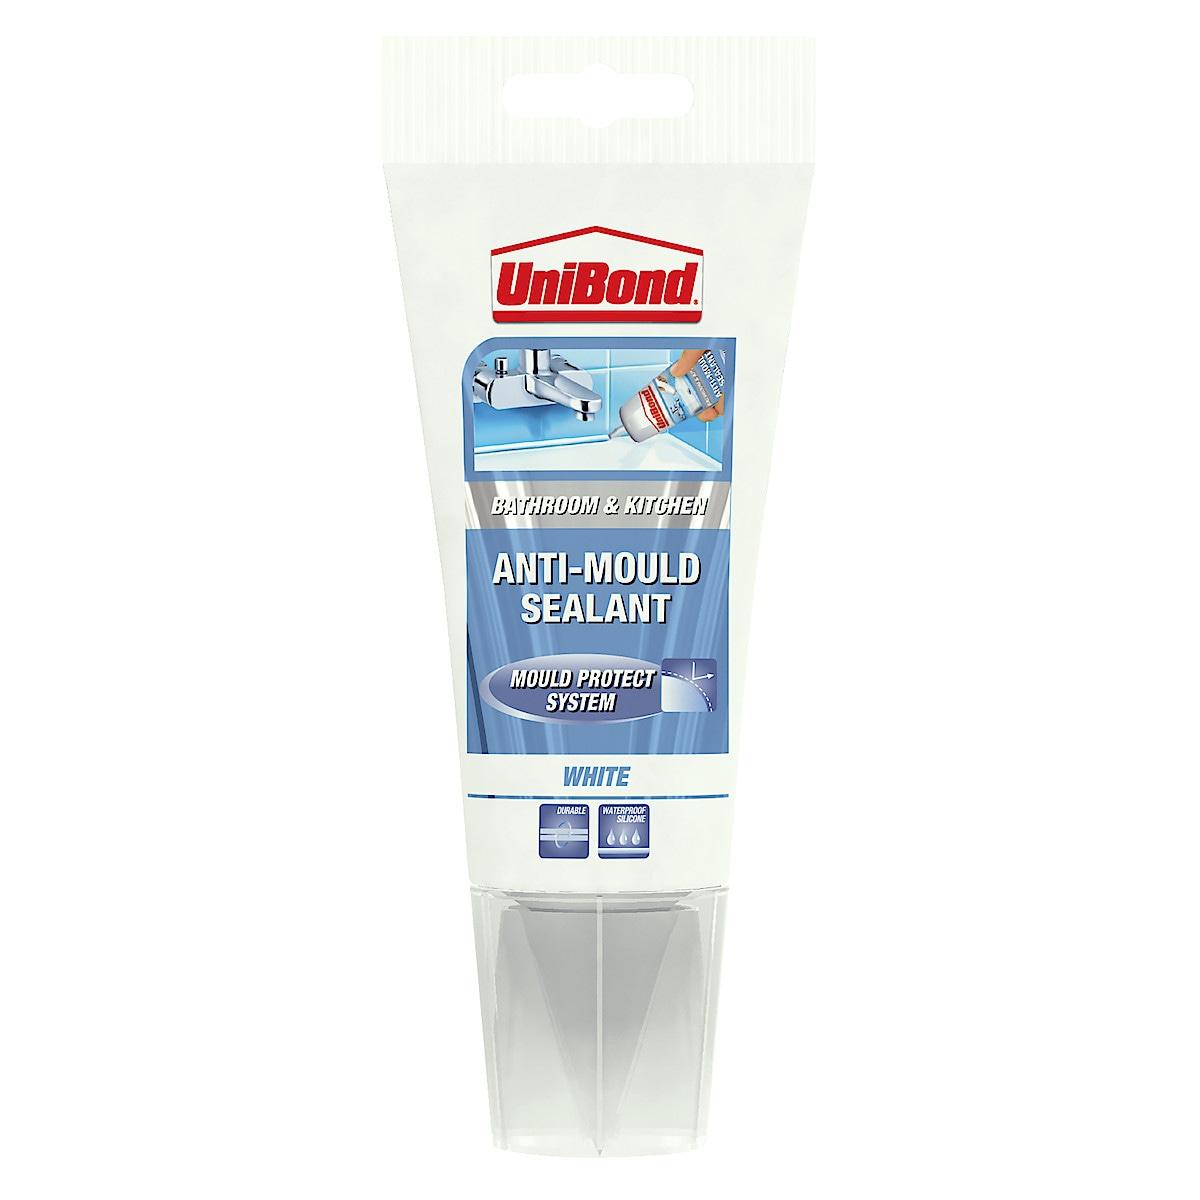 UniBond Anti-Mould Kitchen & Bathroom Sealant